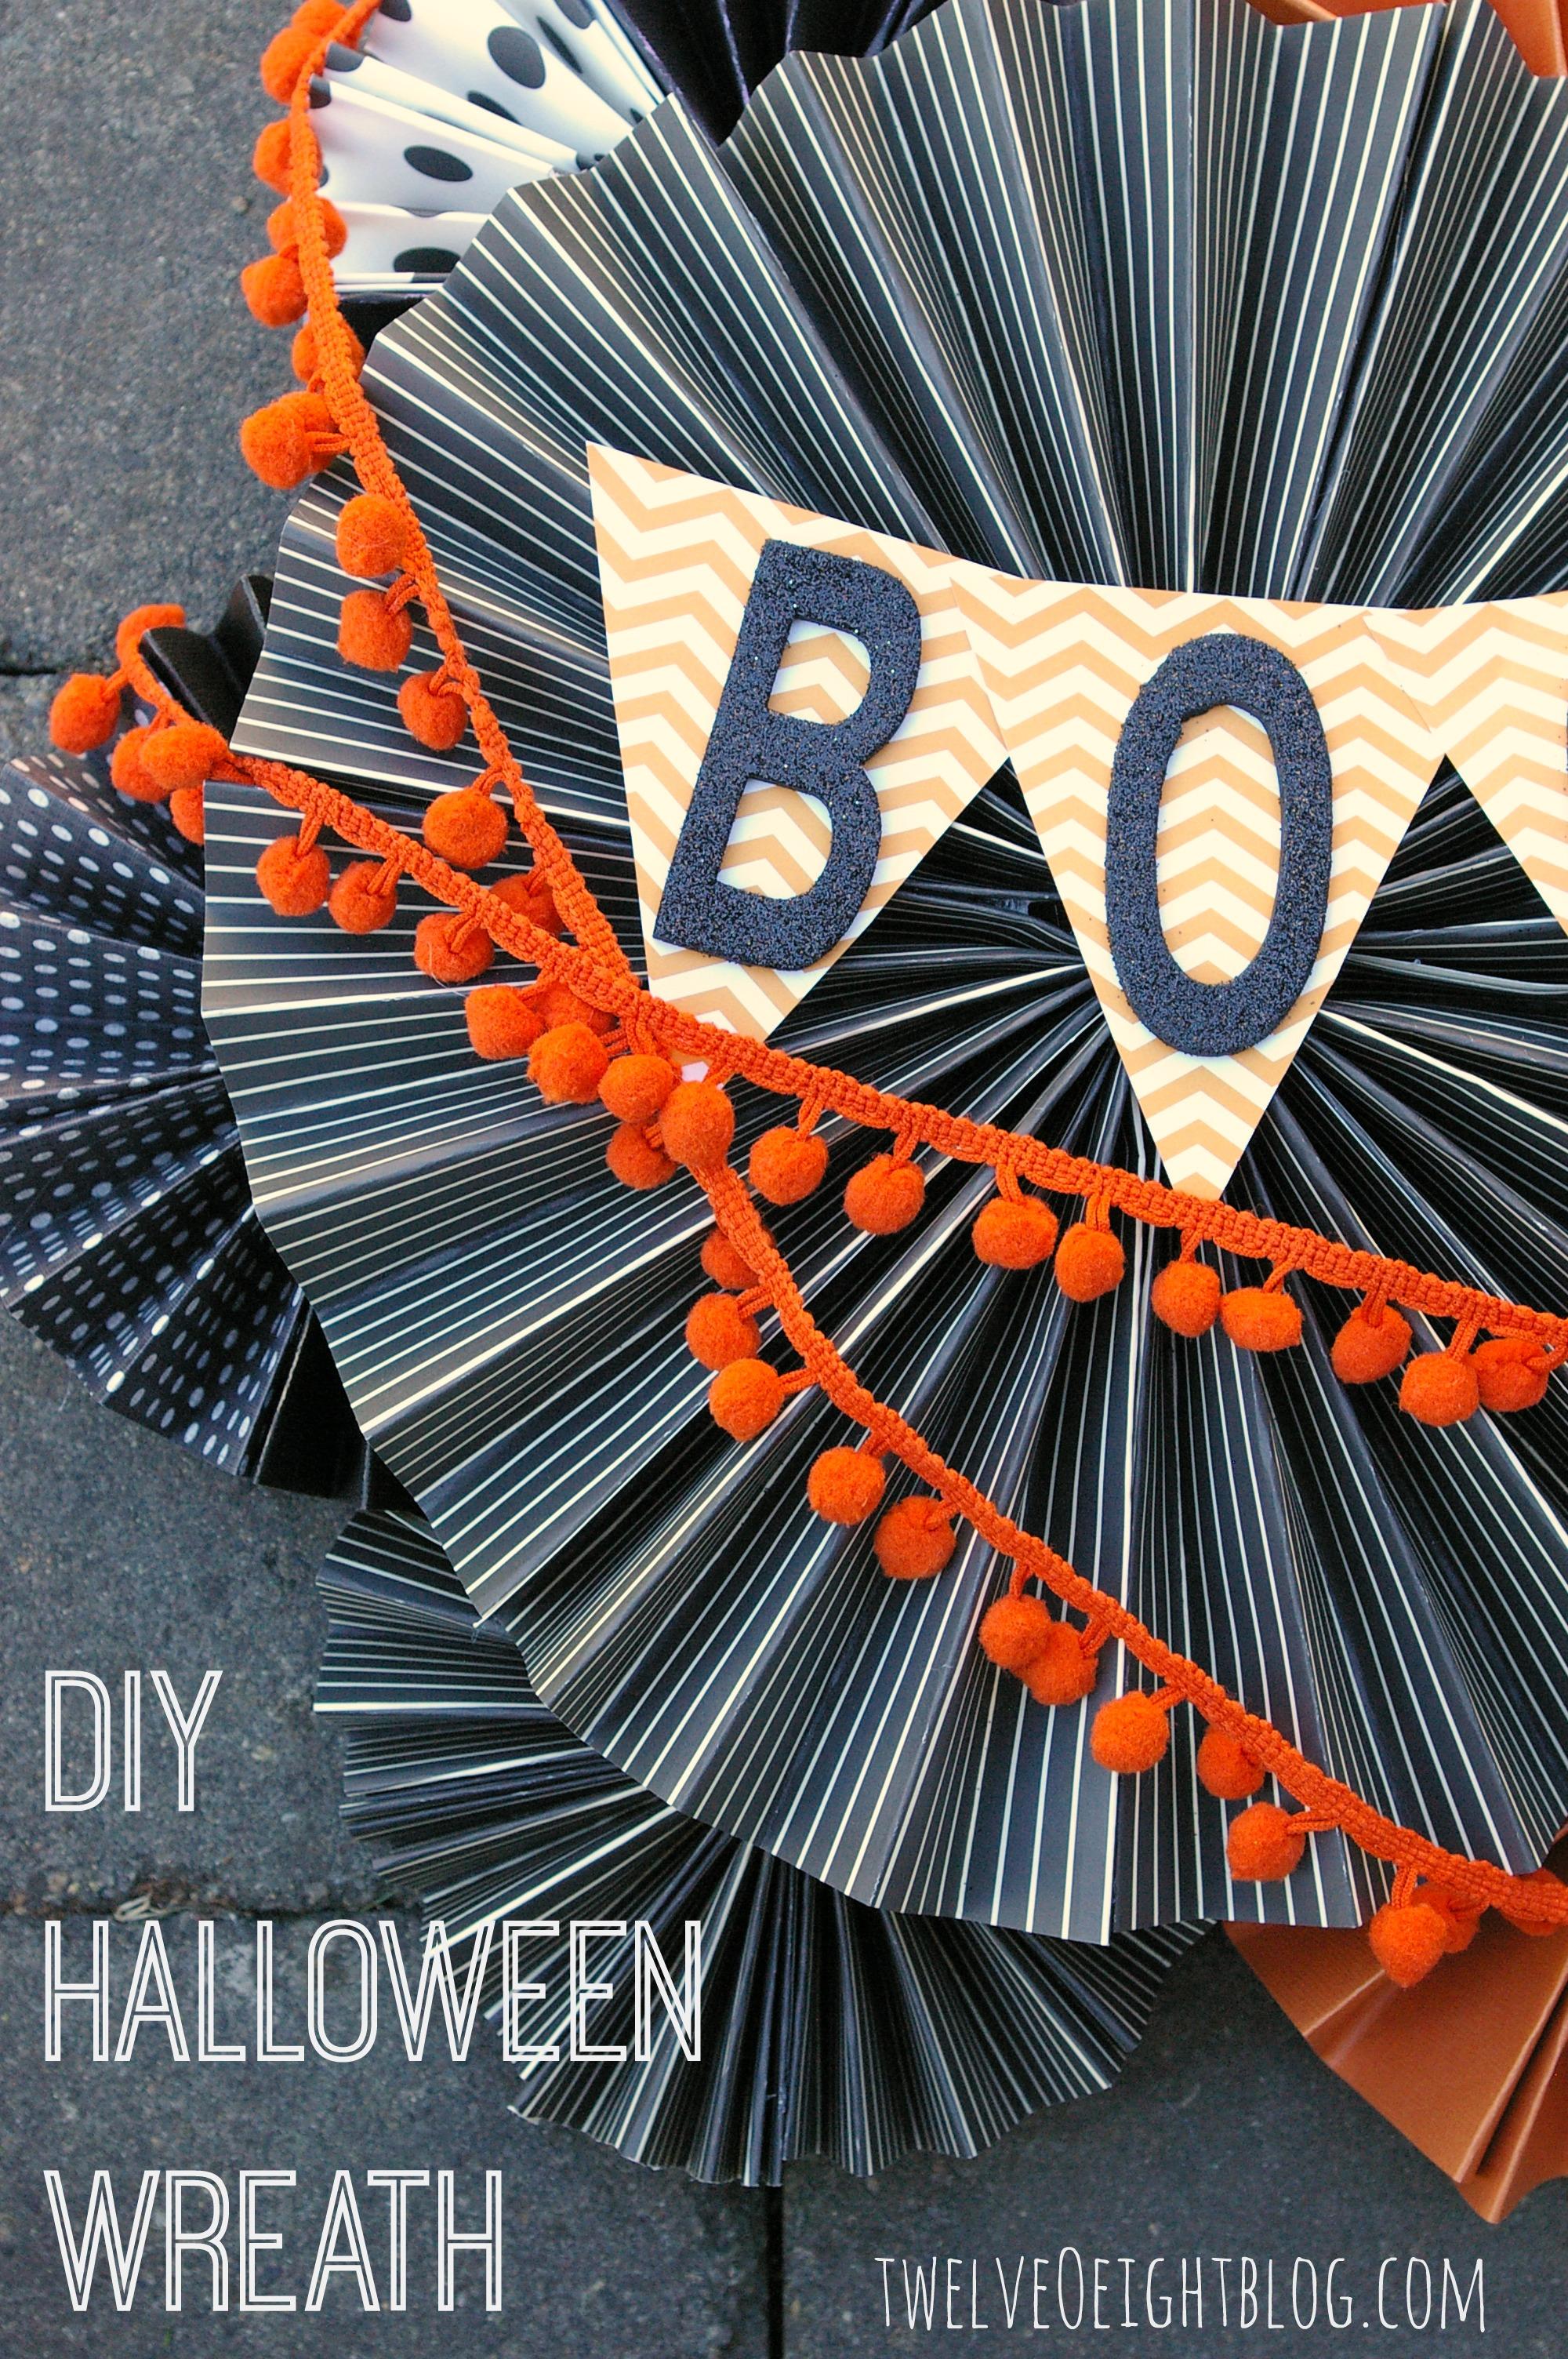 Diy halloween wreath - Easy Diy Halloween Wreath 1